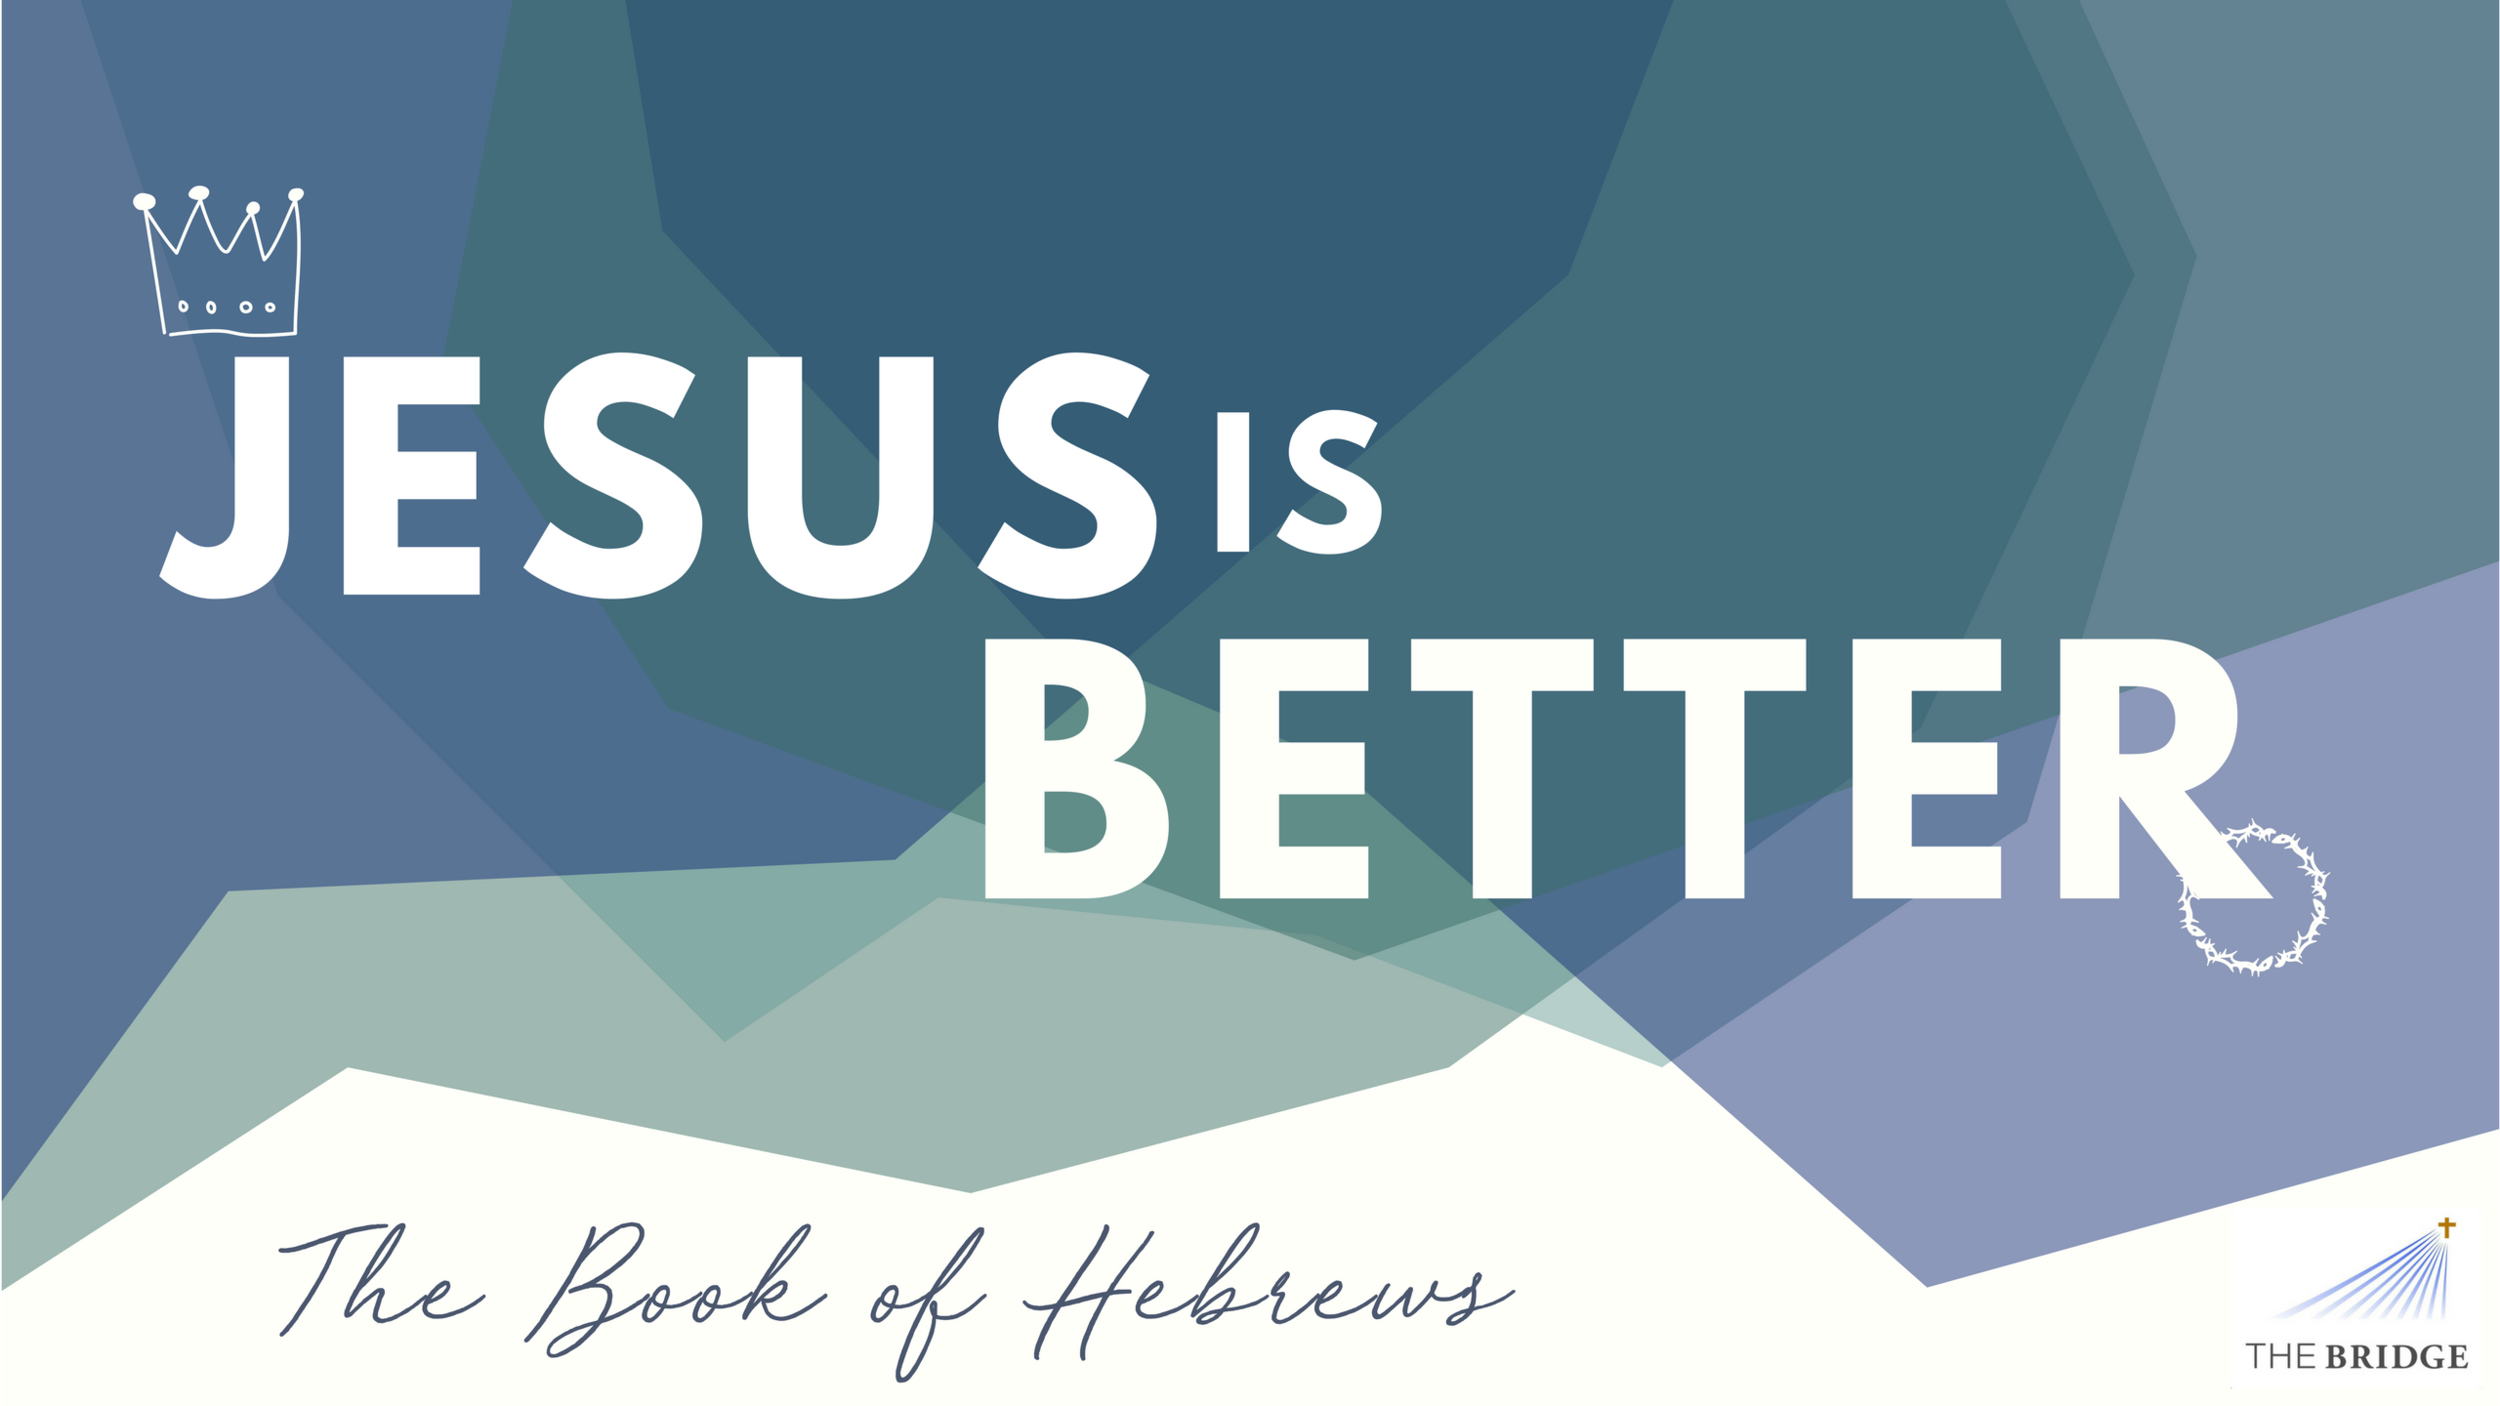 jesus is better.-3.png